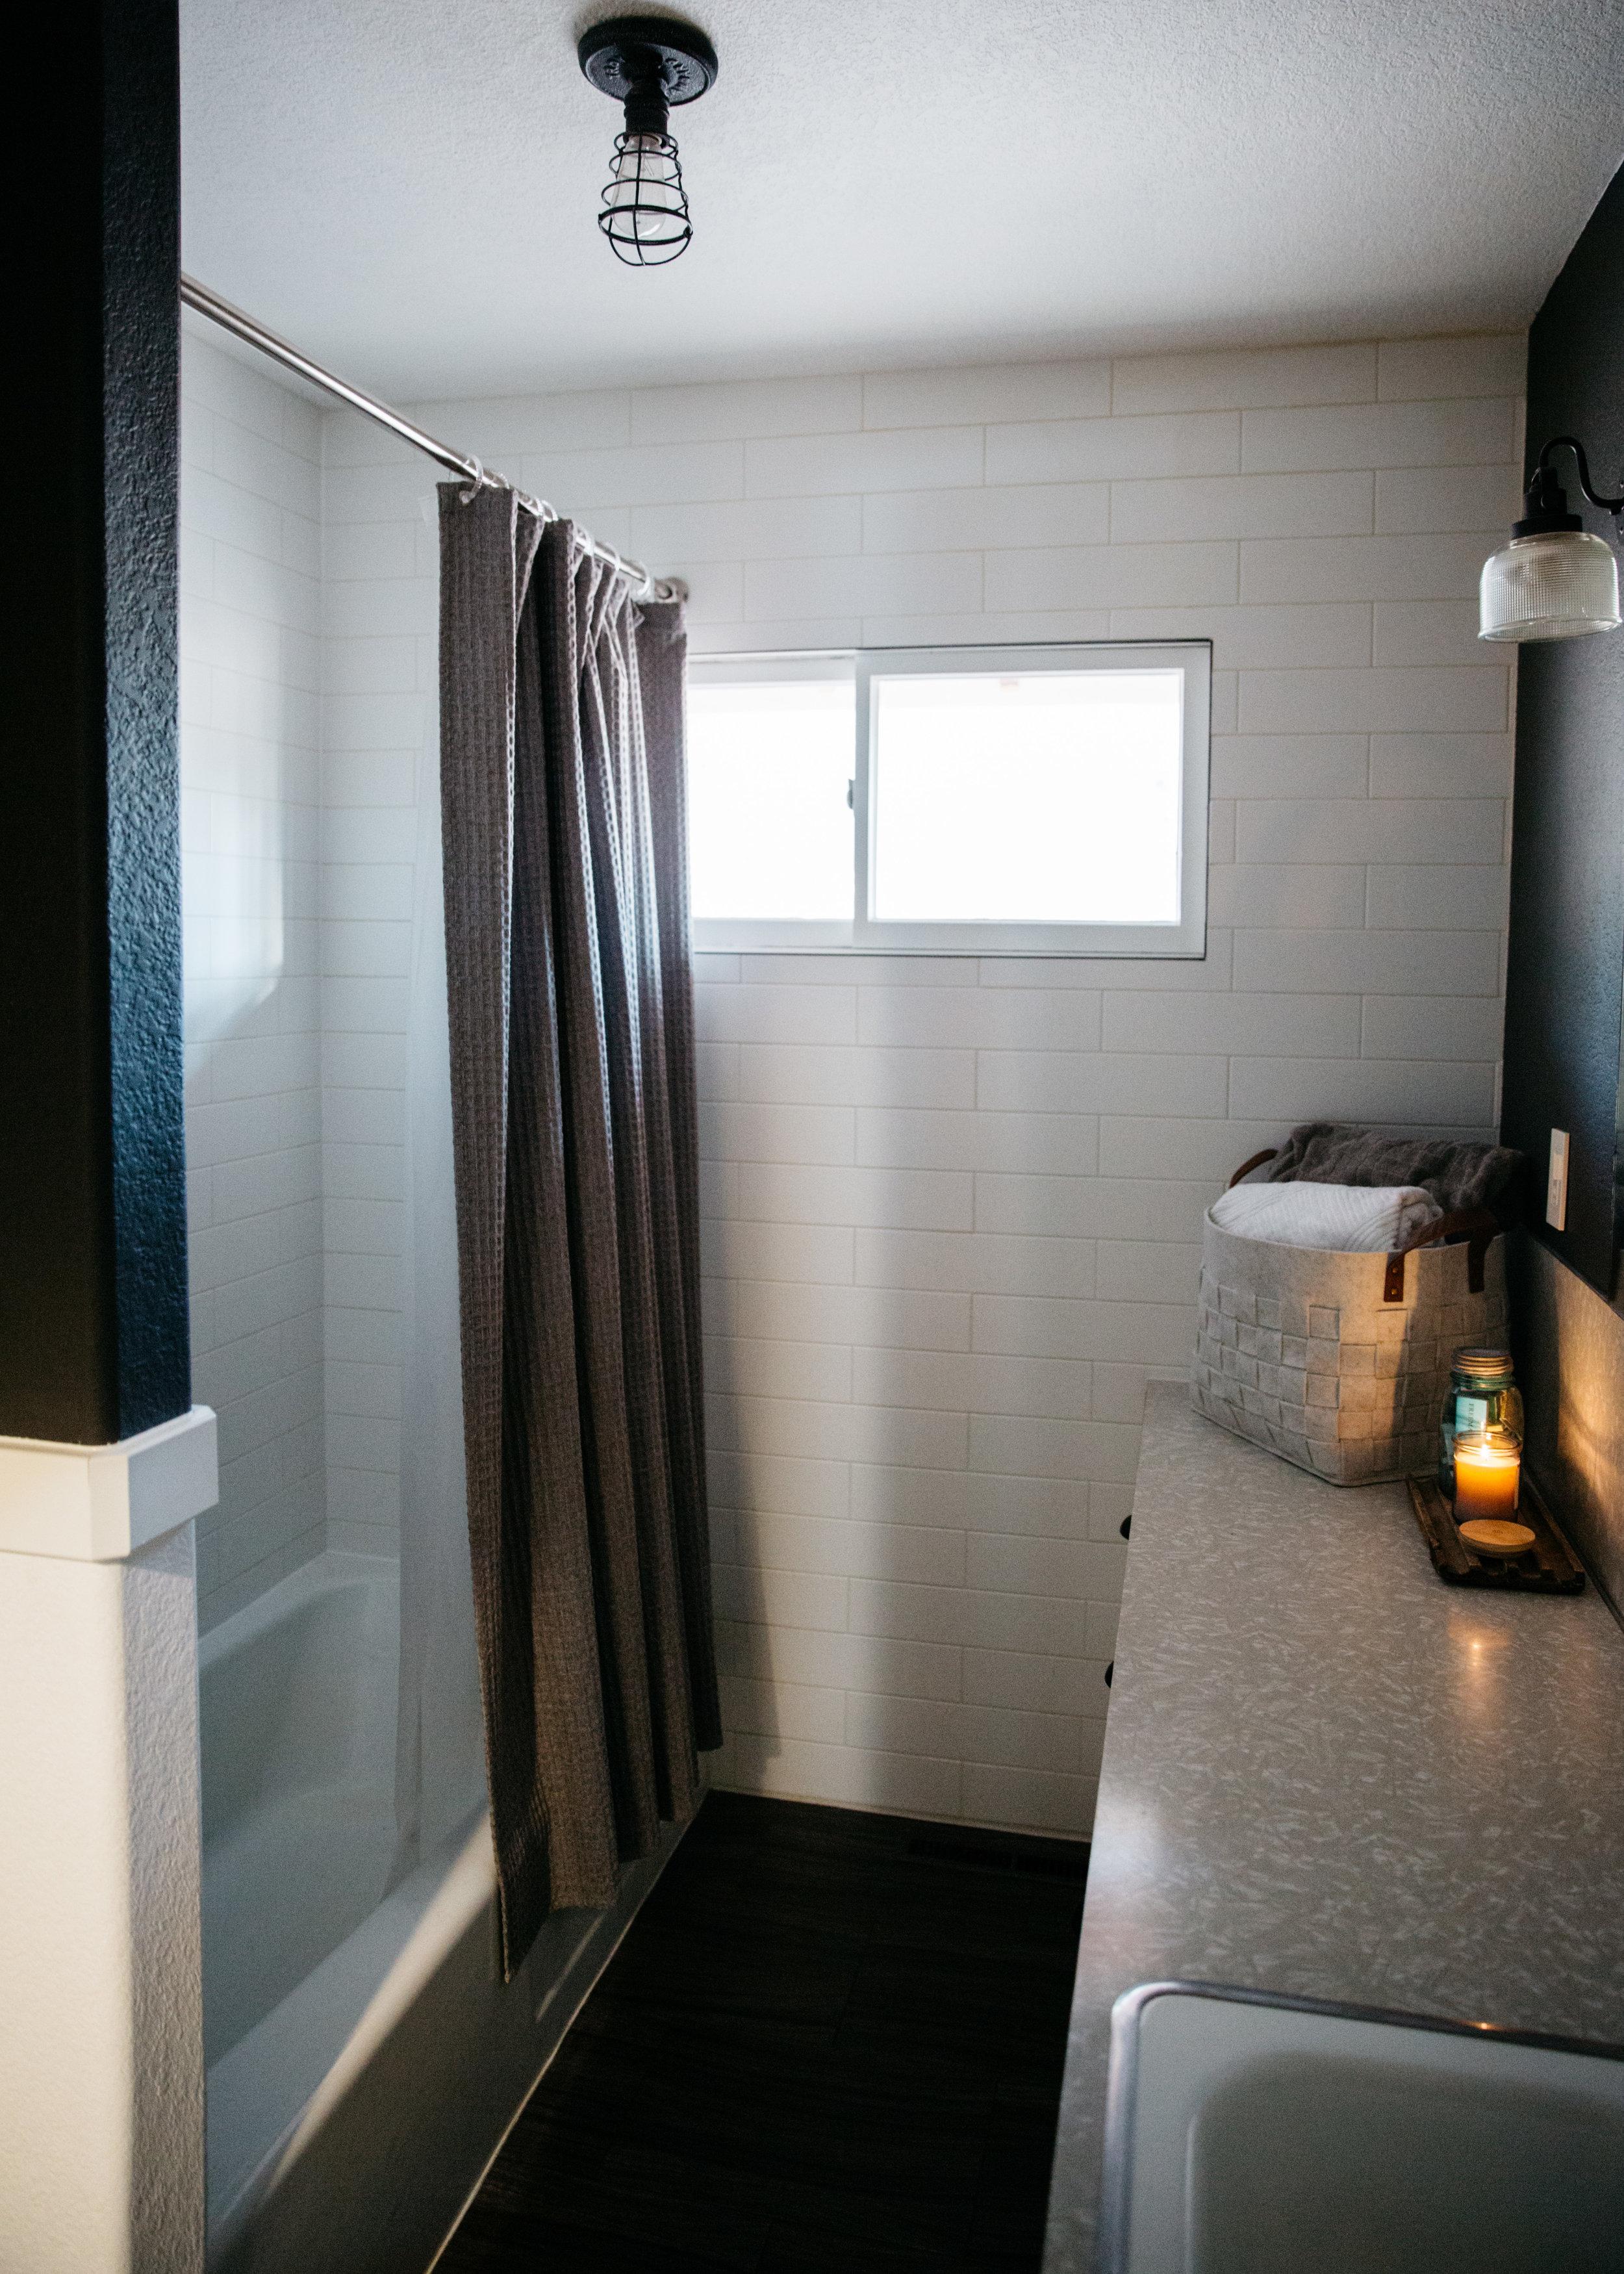 mitchell-guest-bathroom-after-3.jpg